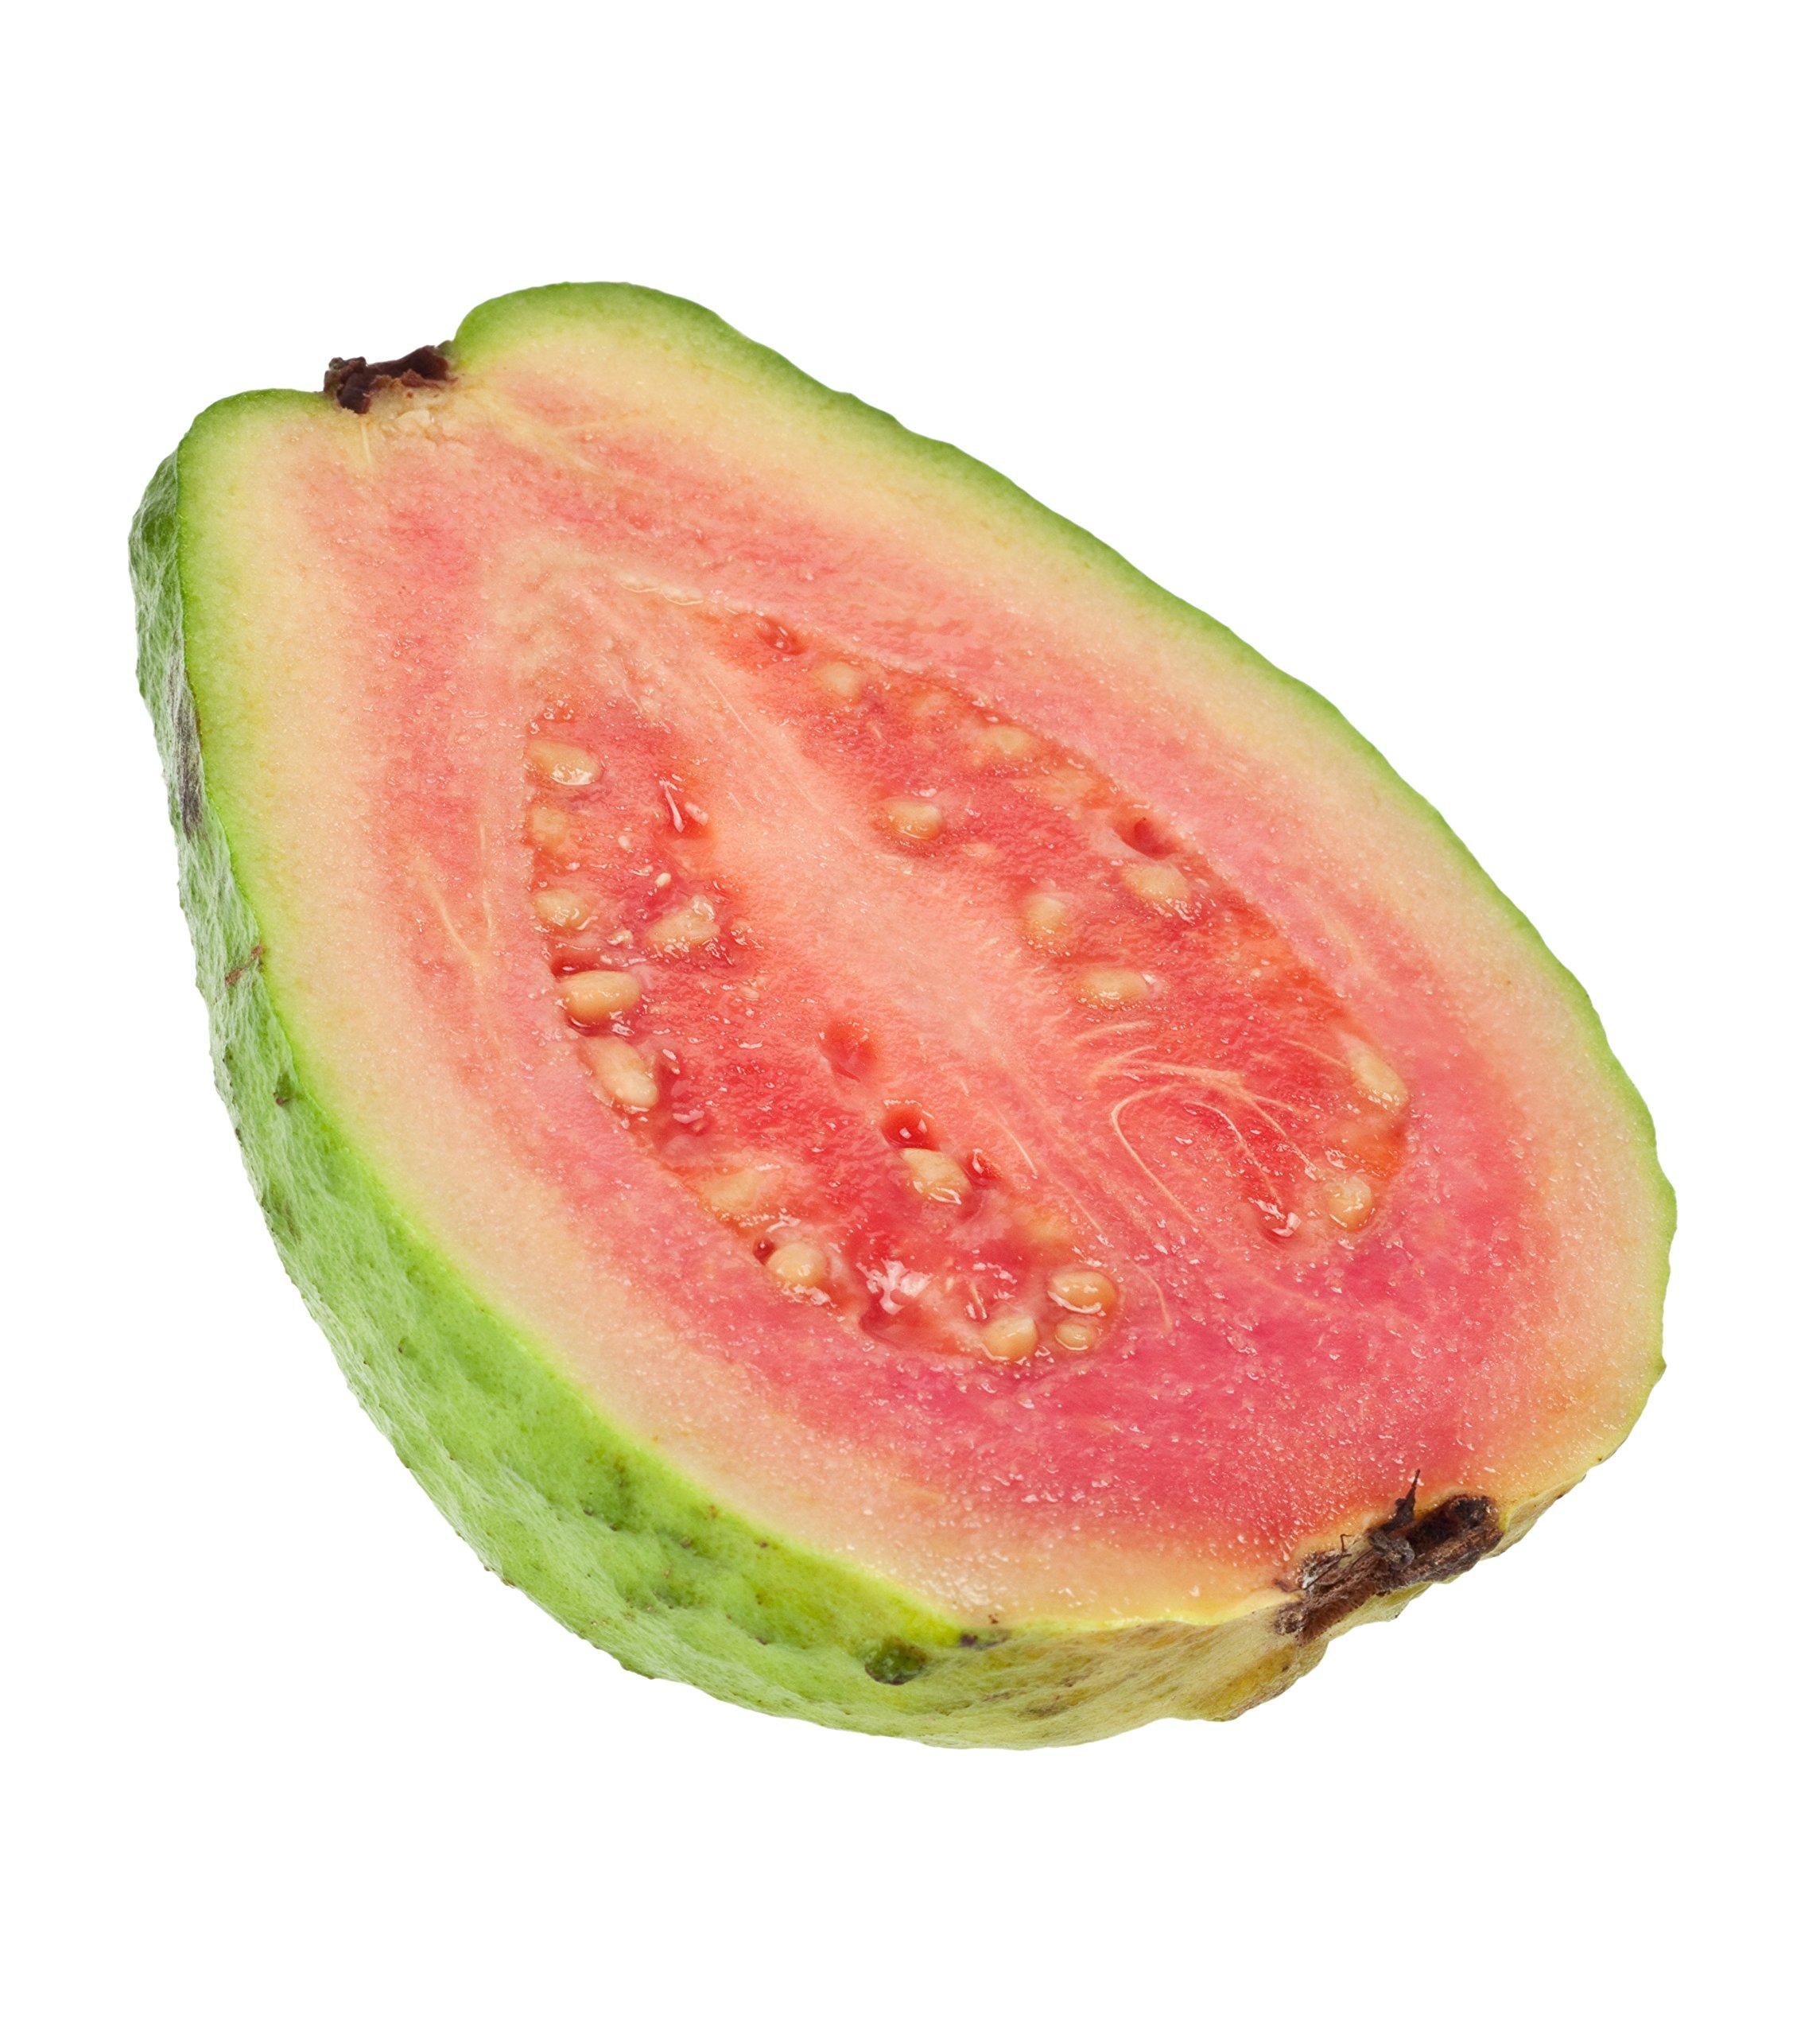 Tikal Guava Psidium guajava LIVE PLANT